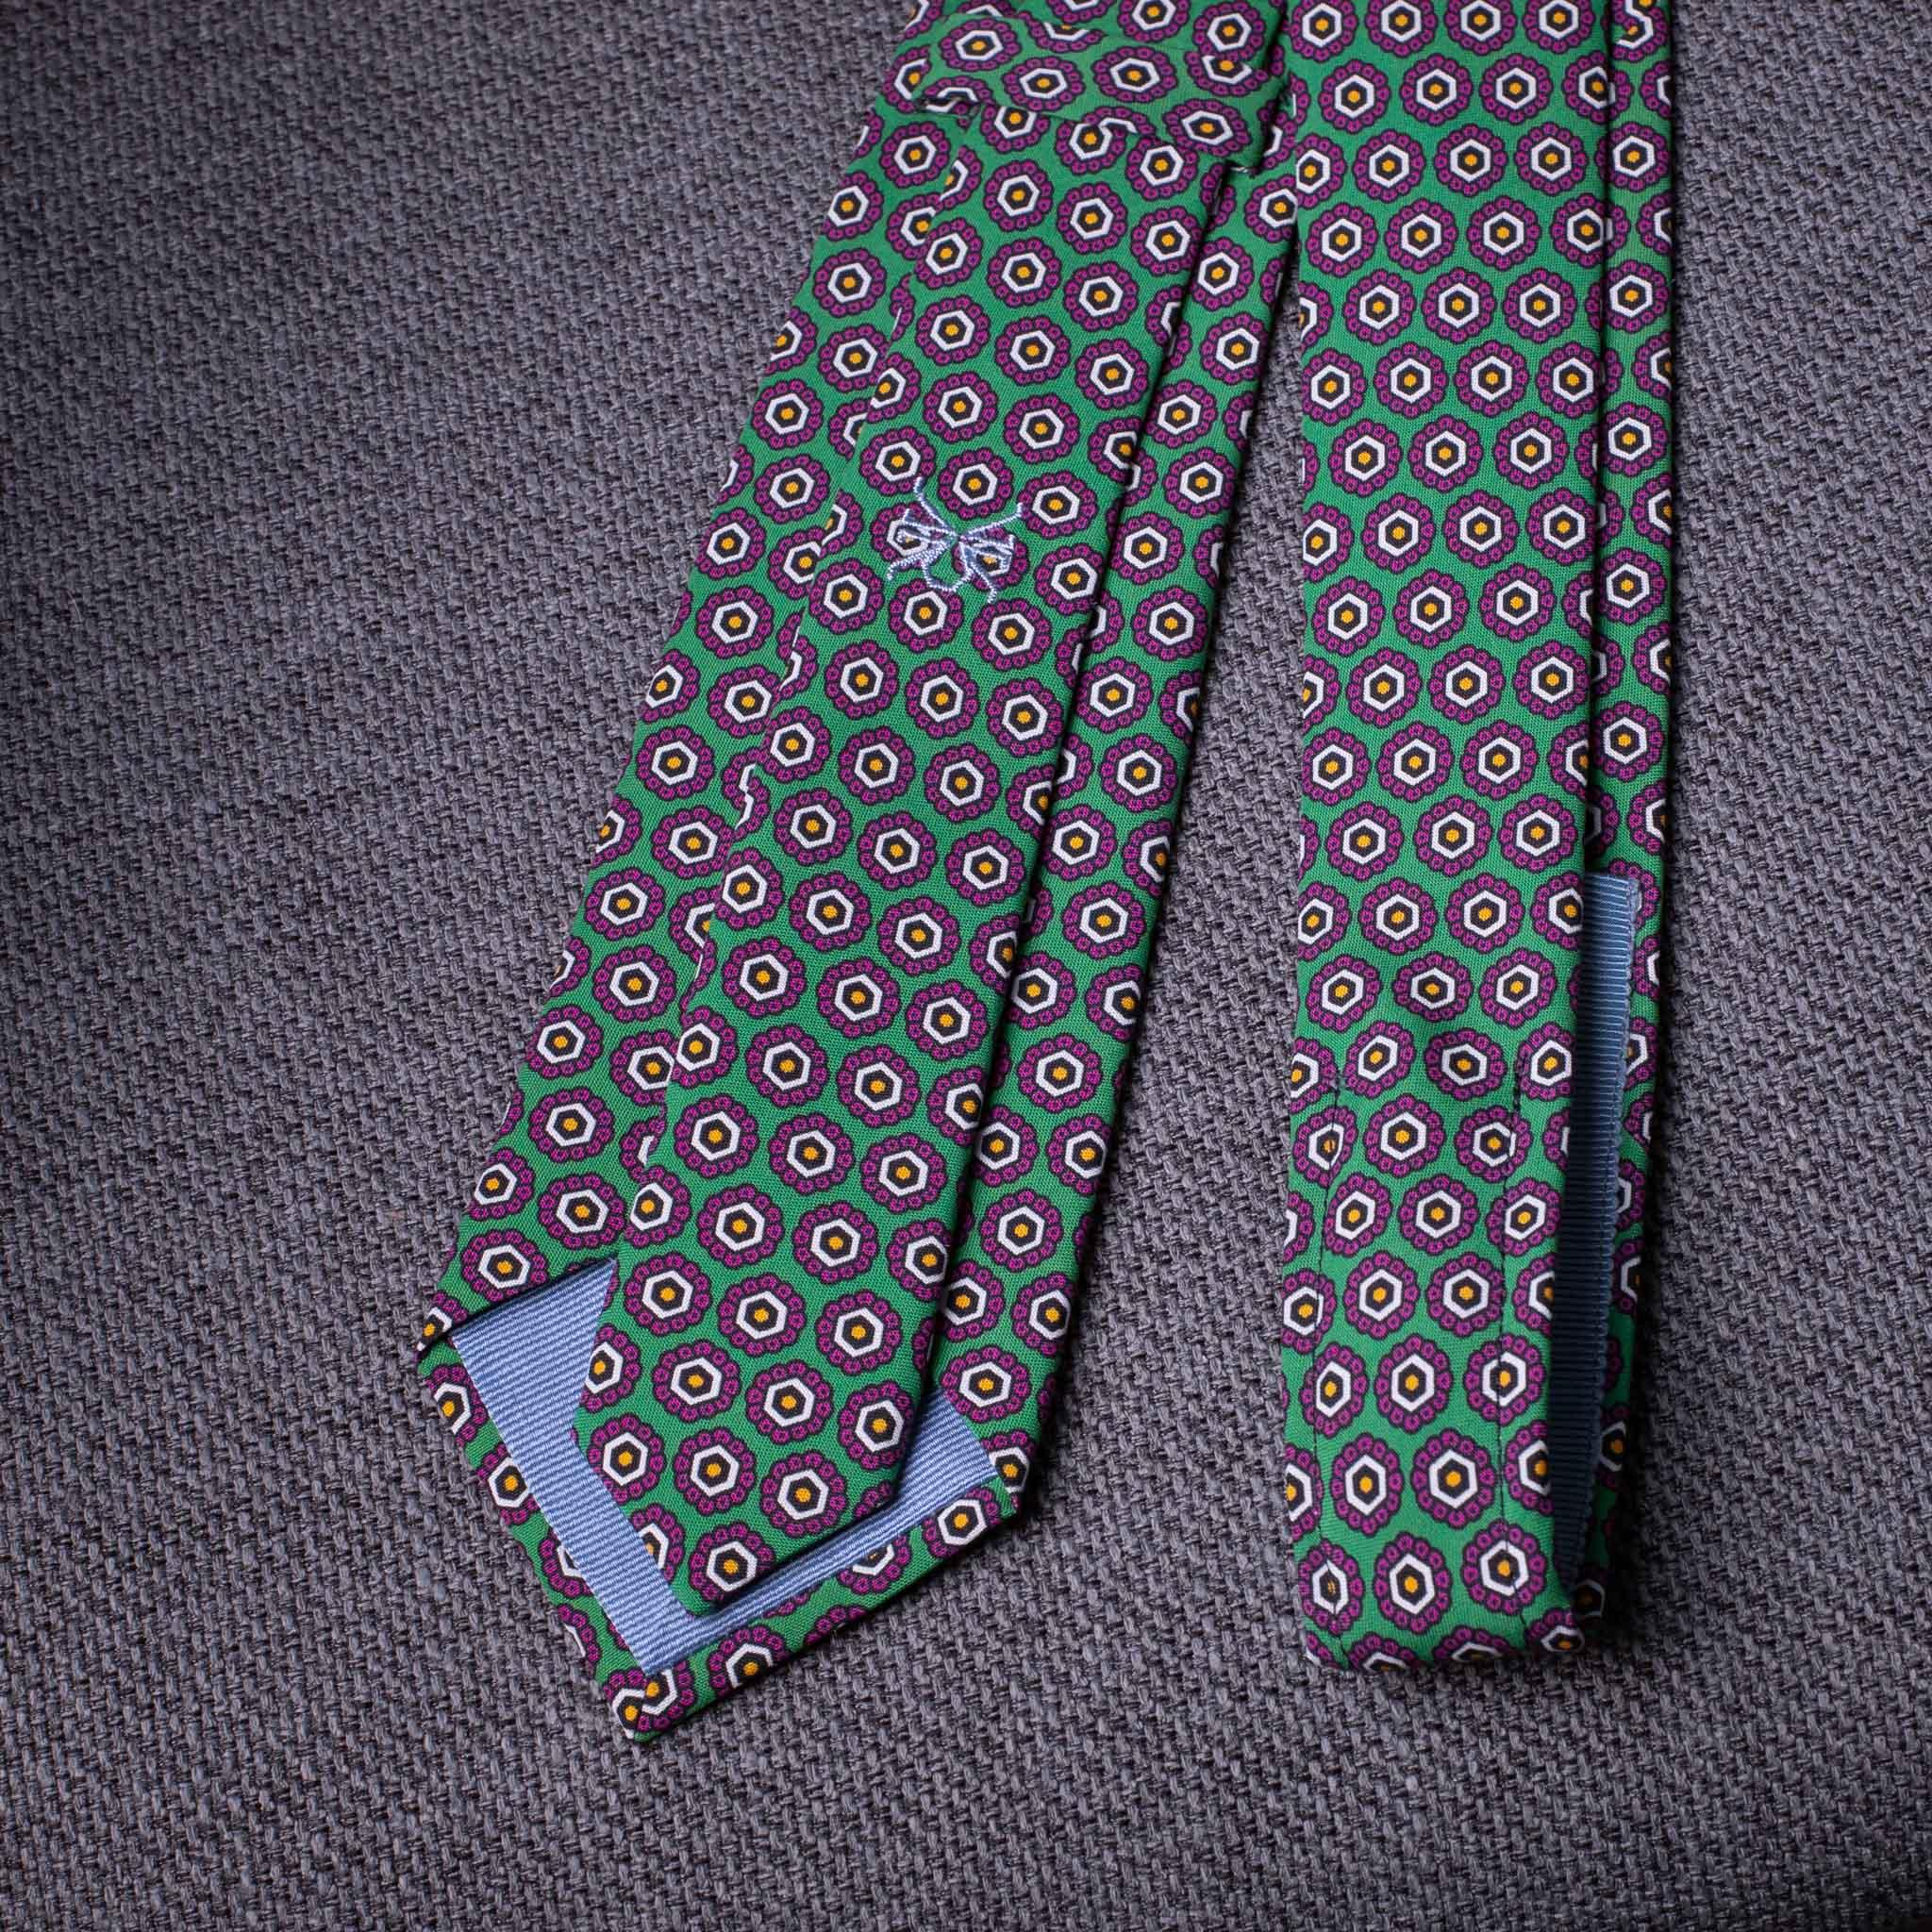 PRINTED SILK-0200-Tie-Initials-Corbata-Iniciales-The-Seelk-4